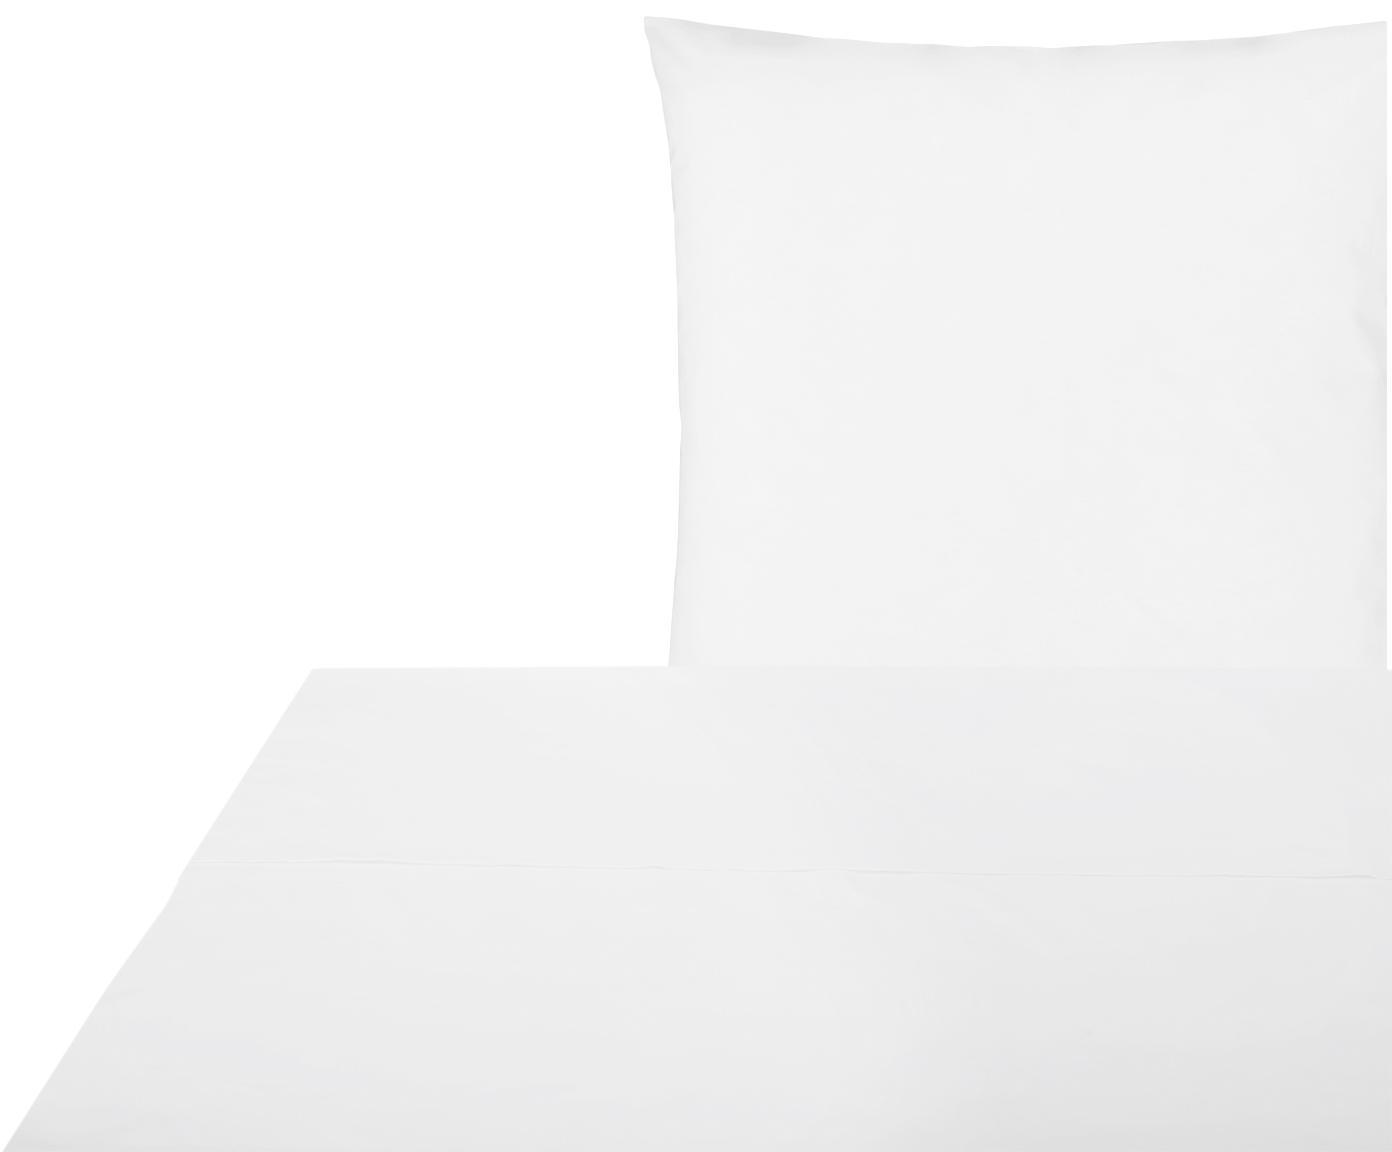 Set lenzuola in percalle Elsie 2 pz, Tessuto: percalle Densità del filo, Bianco, 150 x 300 cm